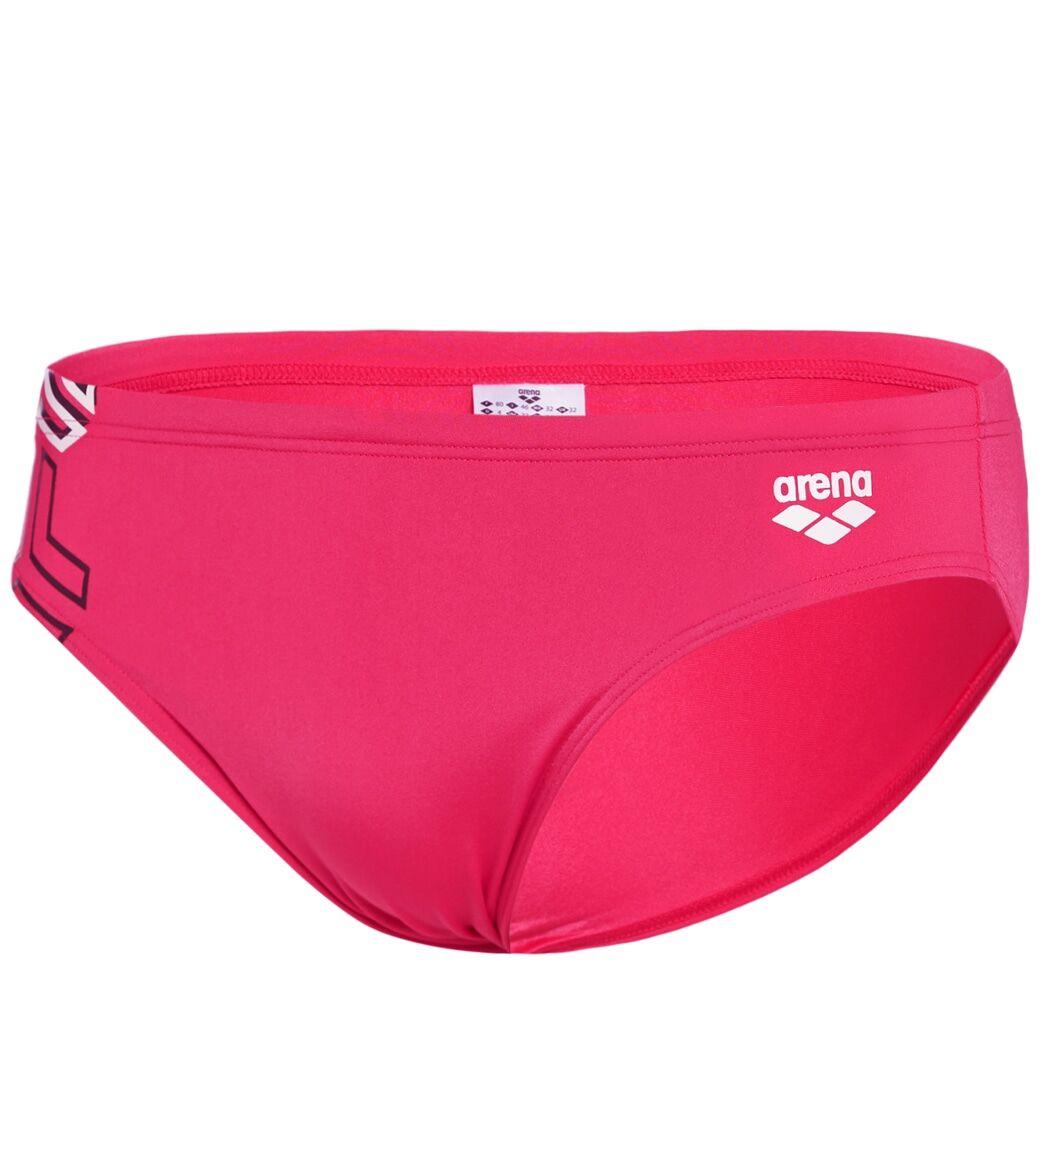 Arena Men's Pink Kikko Brief Swimsuit - Freak Rose 30 - Swimoutlet.com